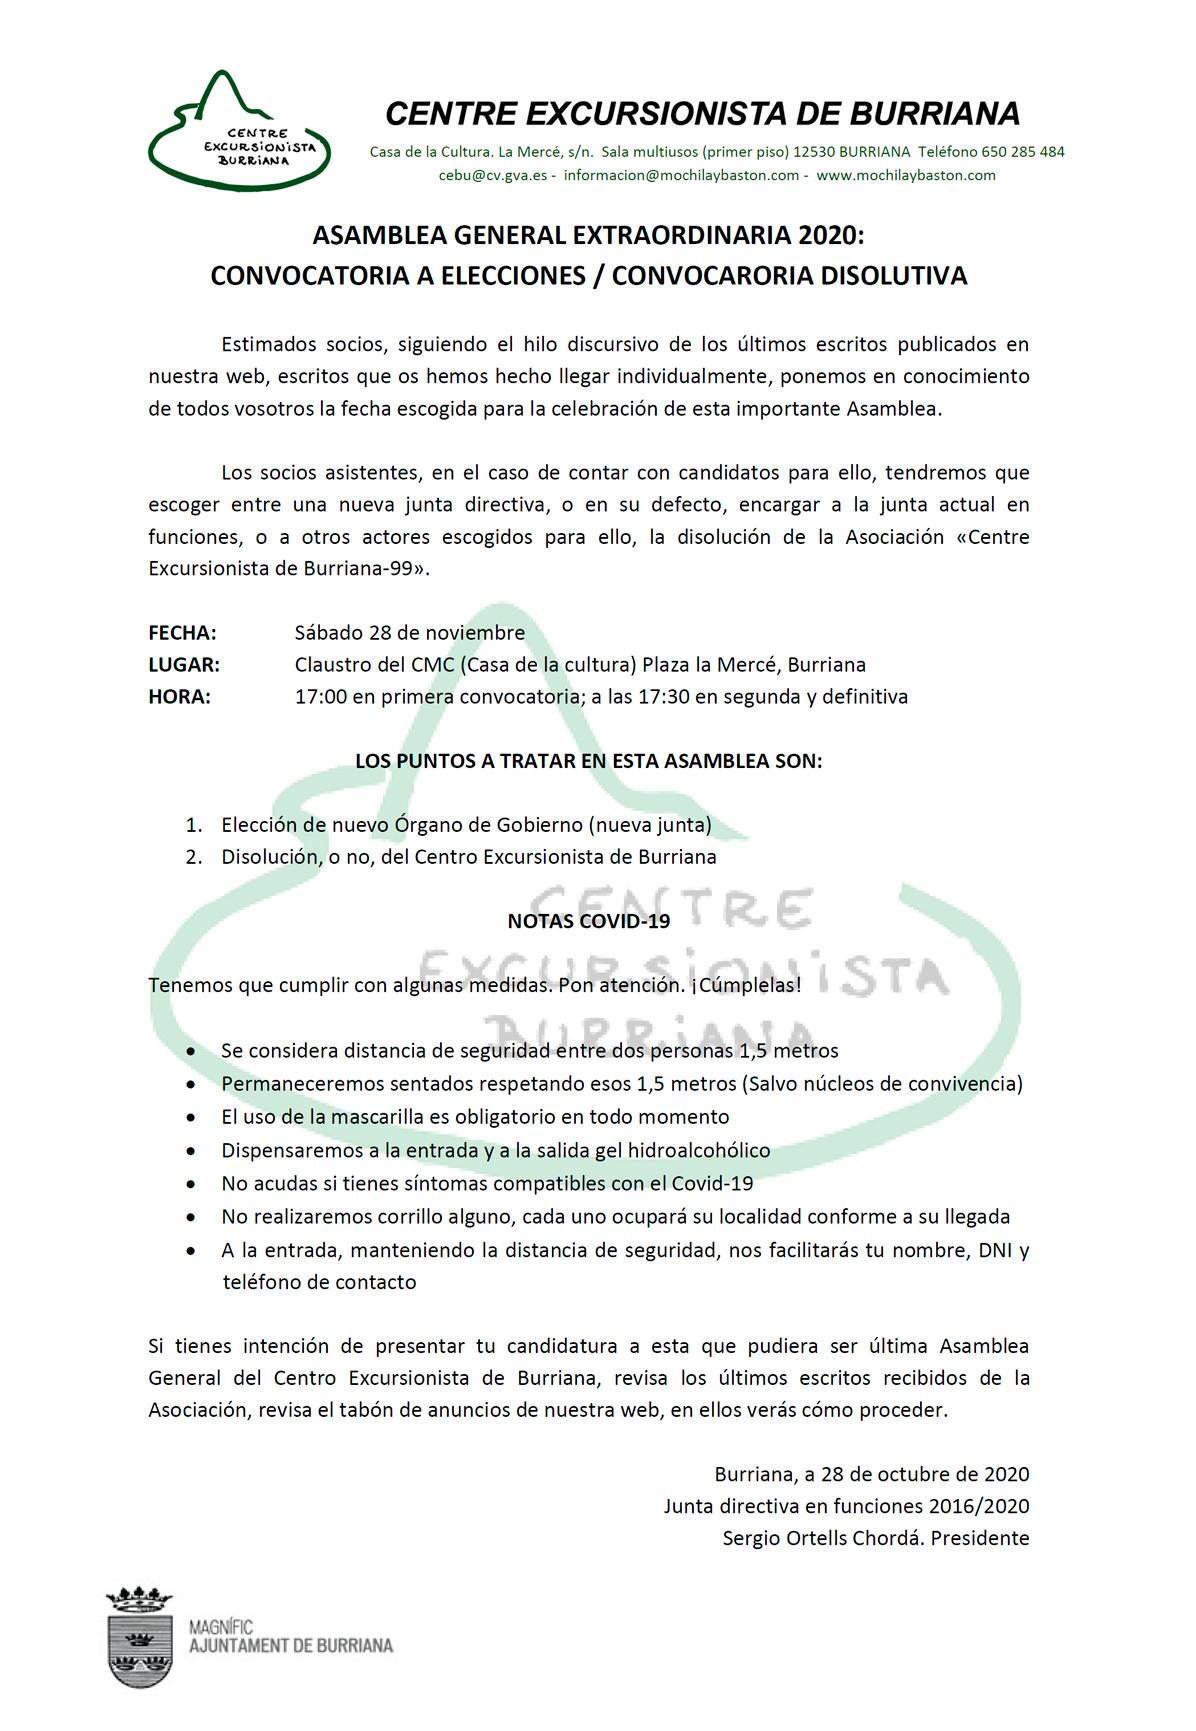 201128_Asamblea_extraordinaria_disolutiva_web